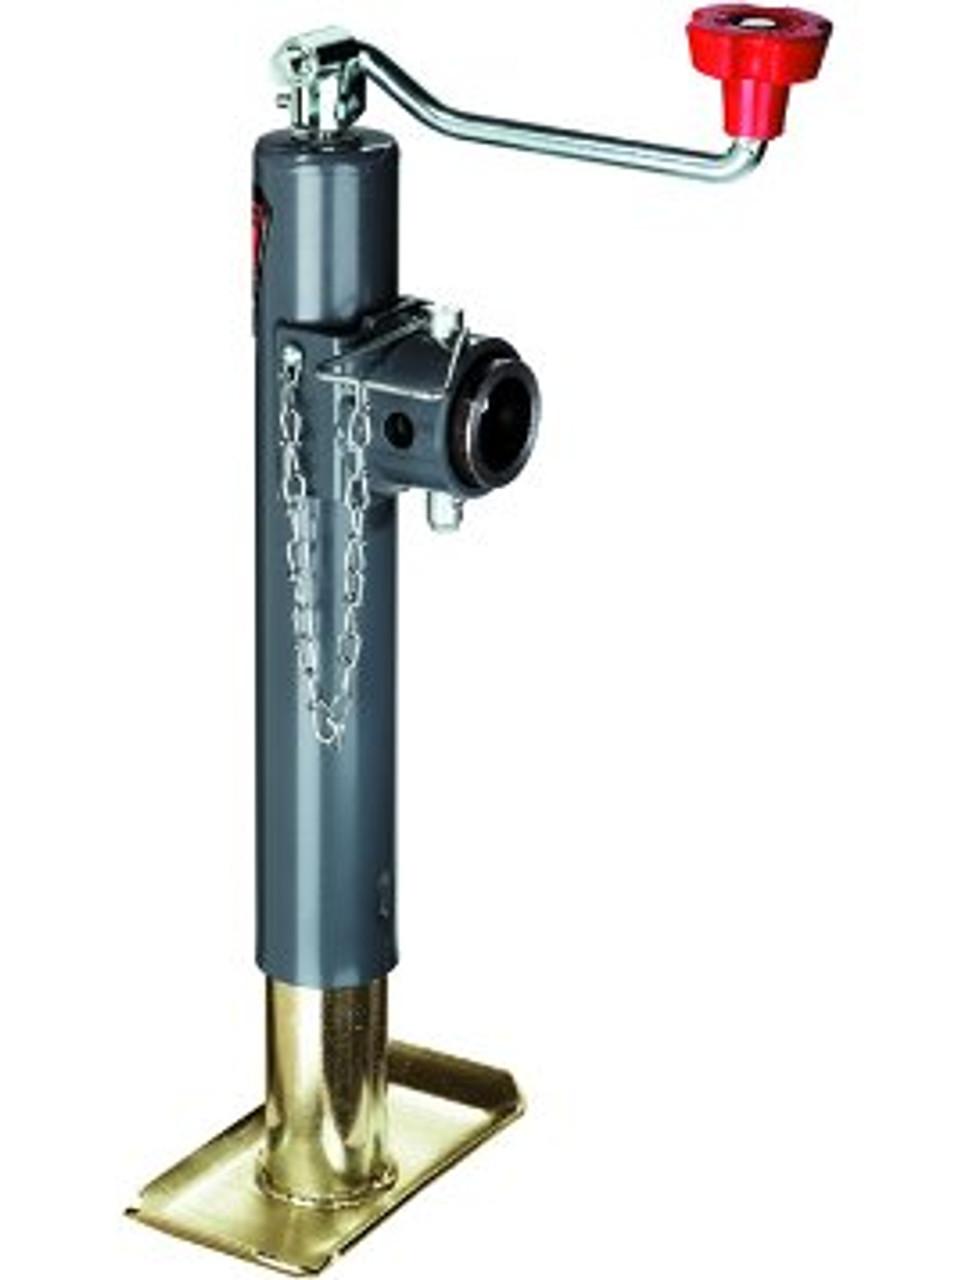 178101 --- BULLDOG Swivel Topwind Trailer Jack - 5,000 lb